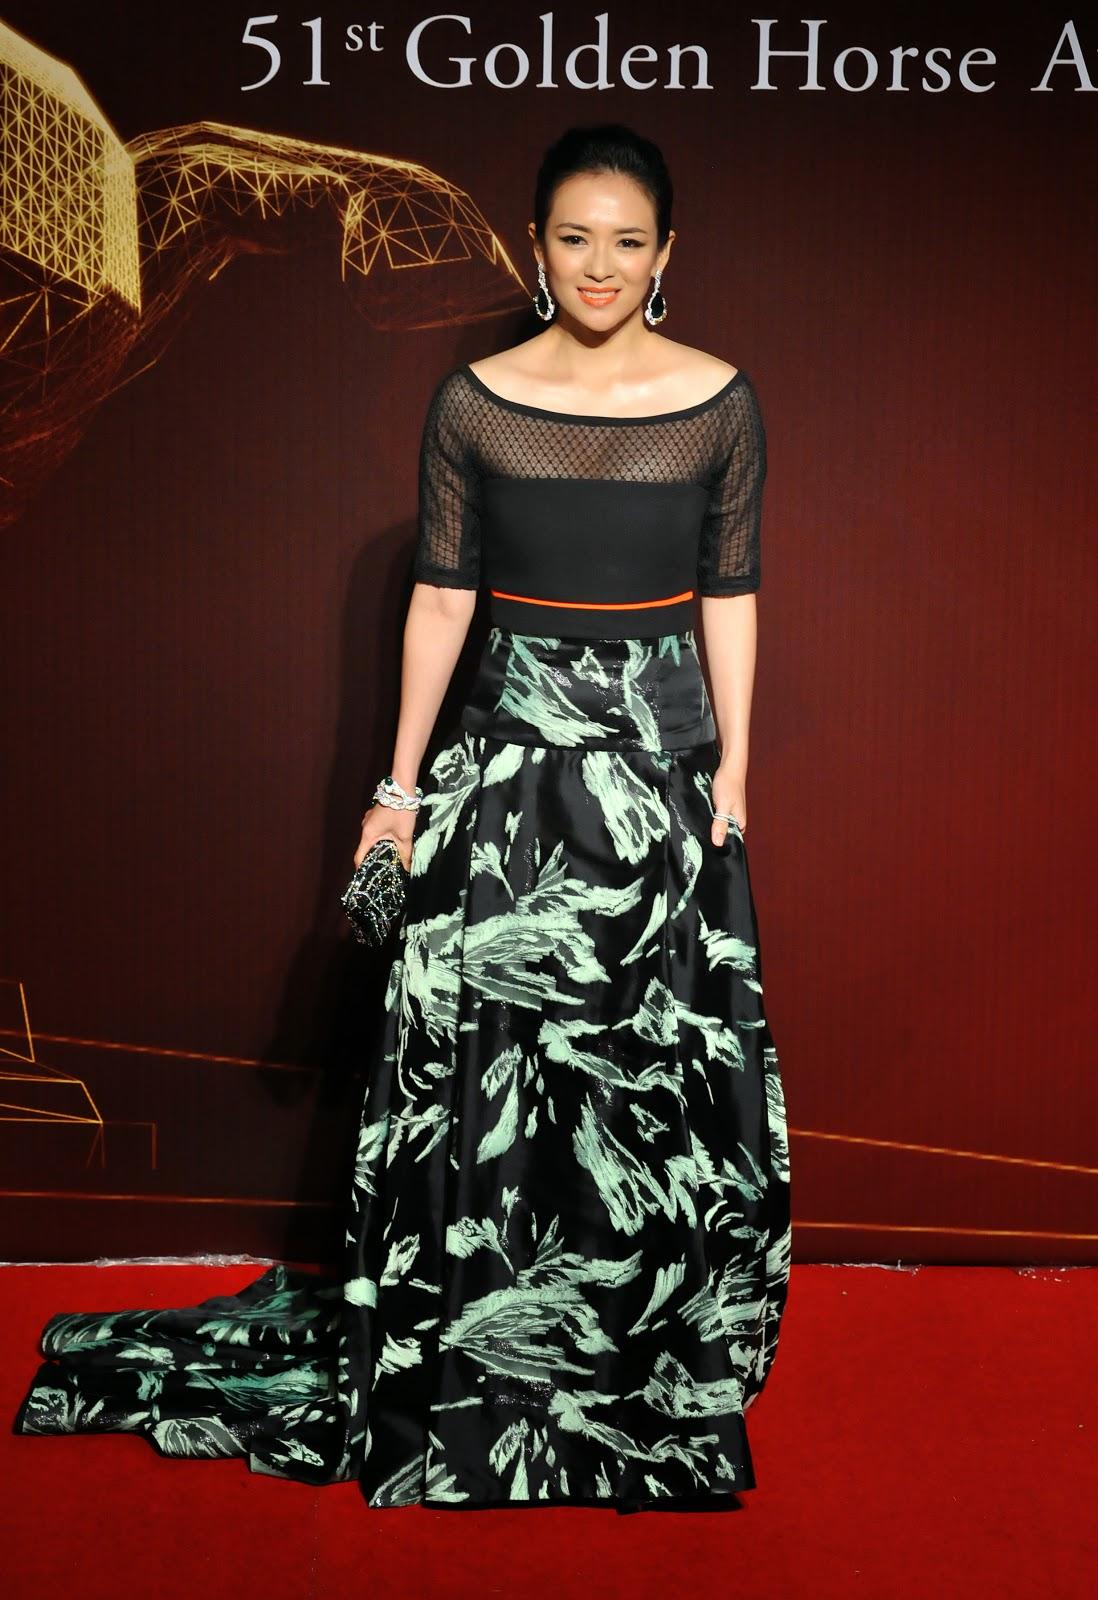 Golden Horse Awards 2014 Celebrities HD Images